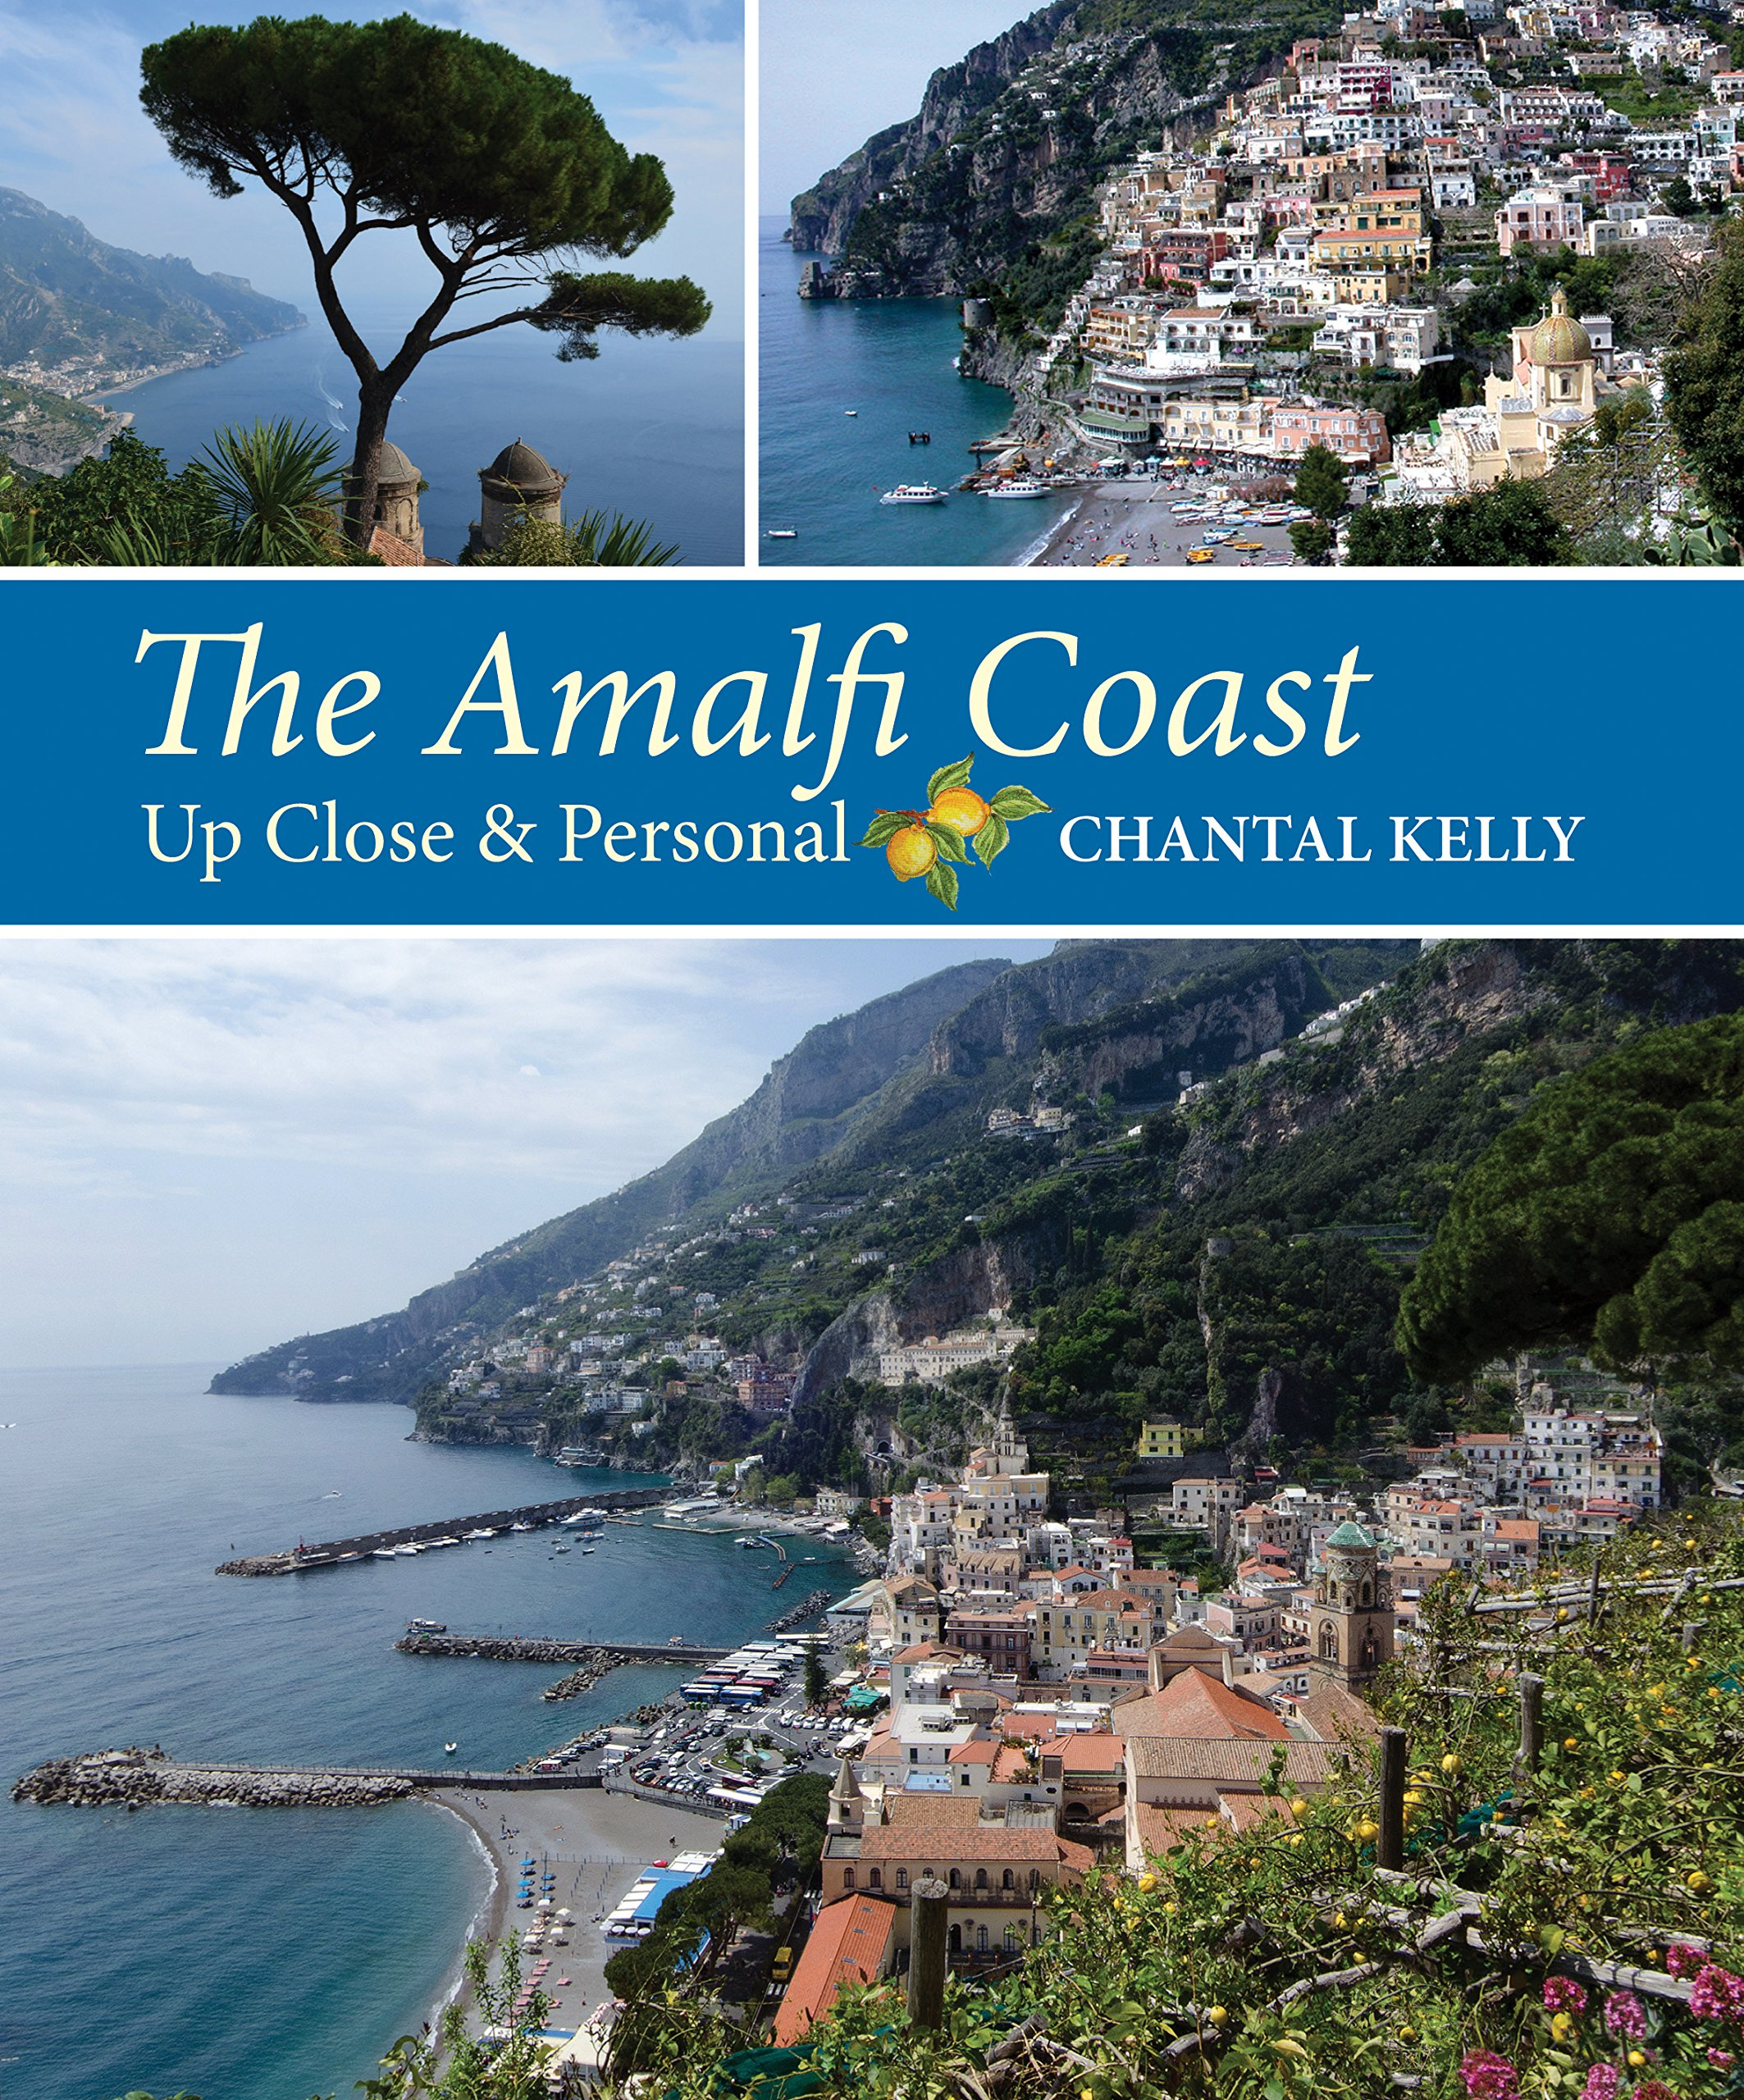 the amalfi coast up close personal chantal kelly 9780983221715